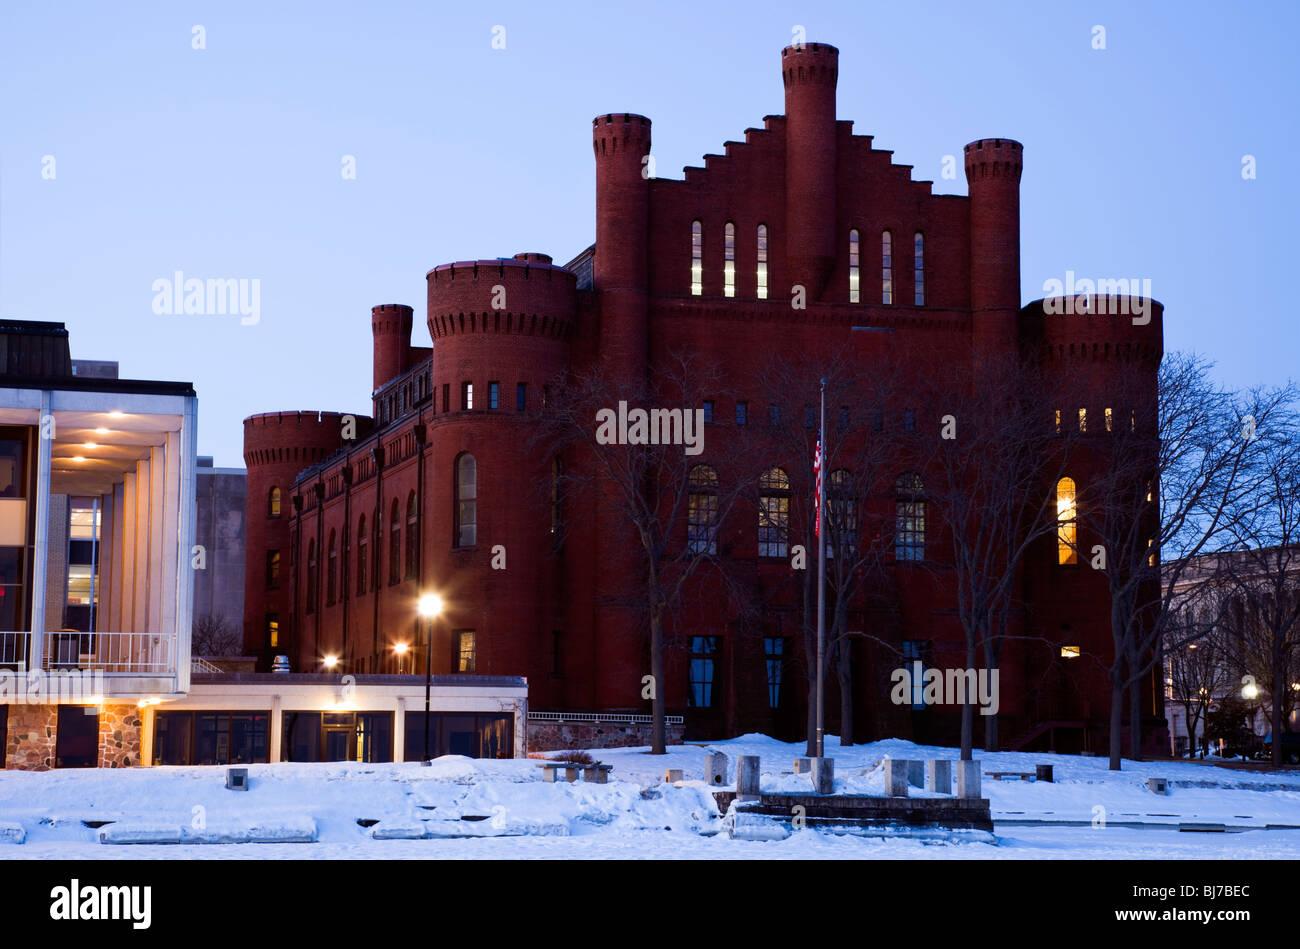 Historic Building - University of Wisconsin - seen from frozen Lake Mendota. Stock Photo